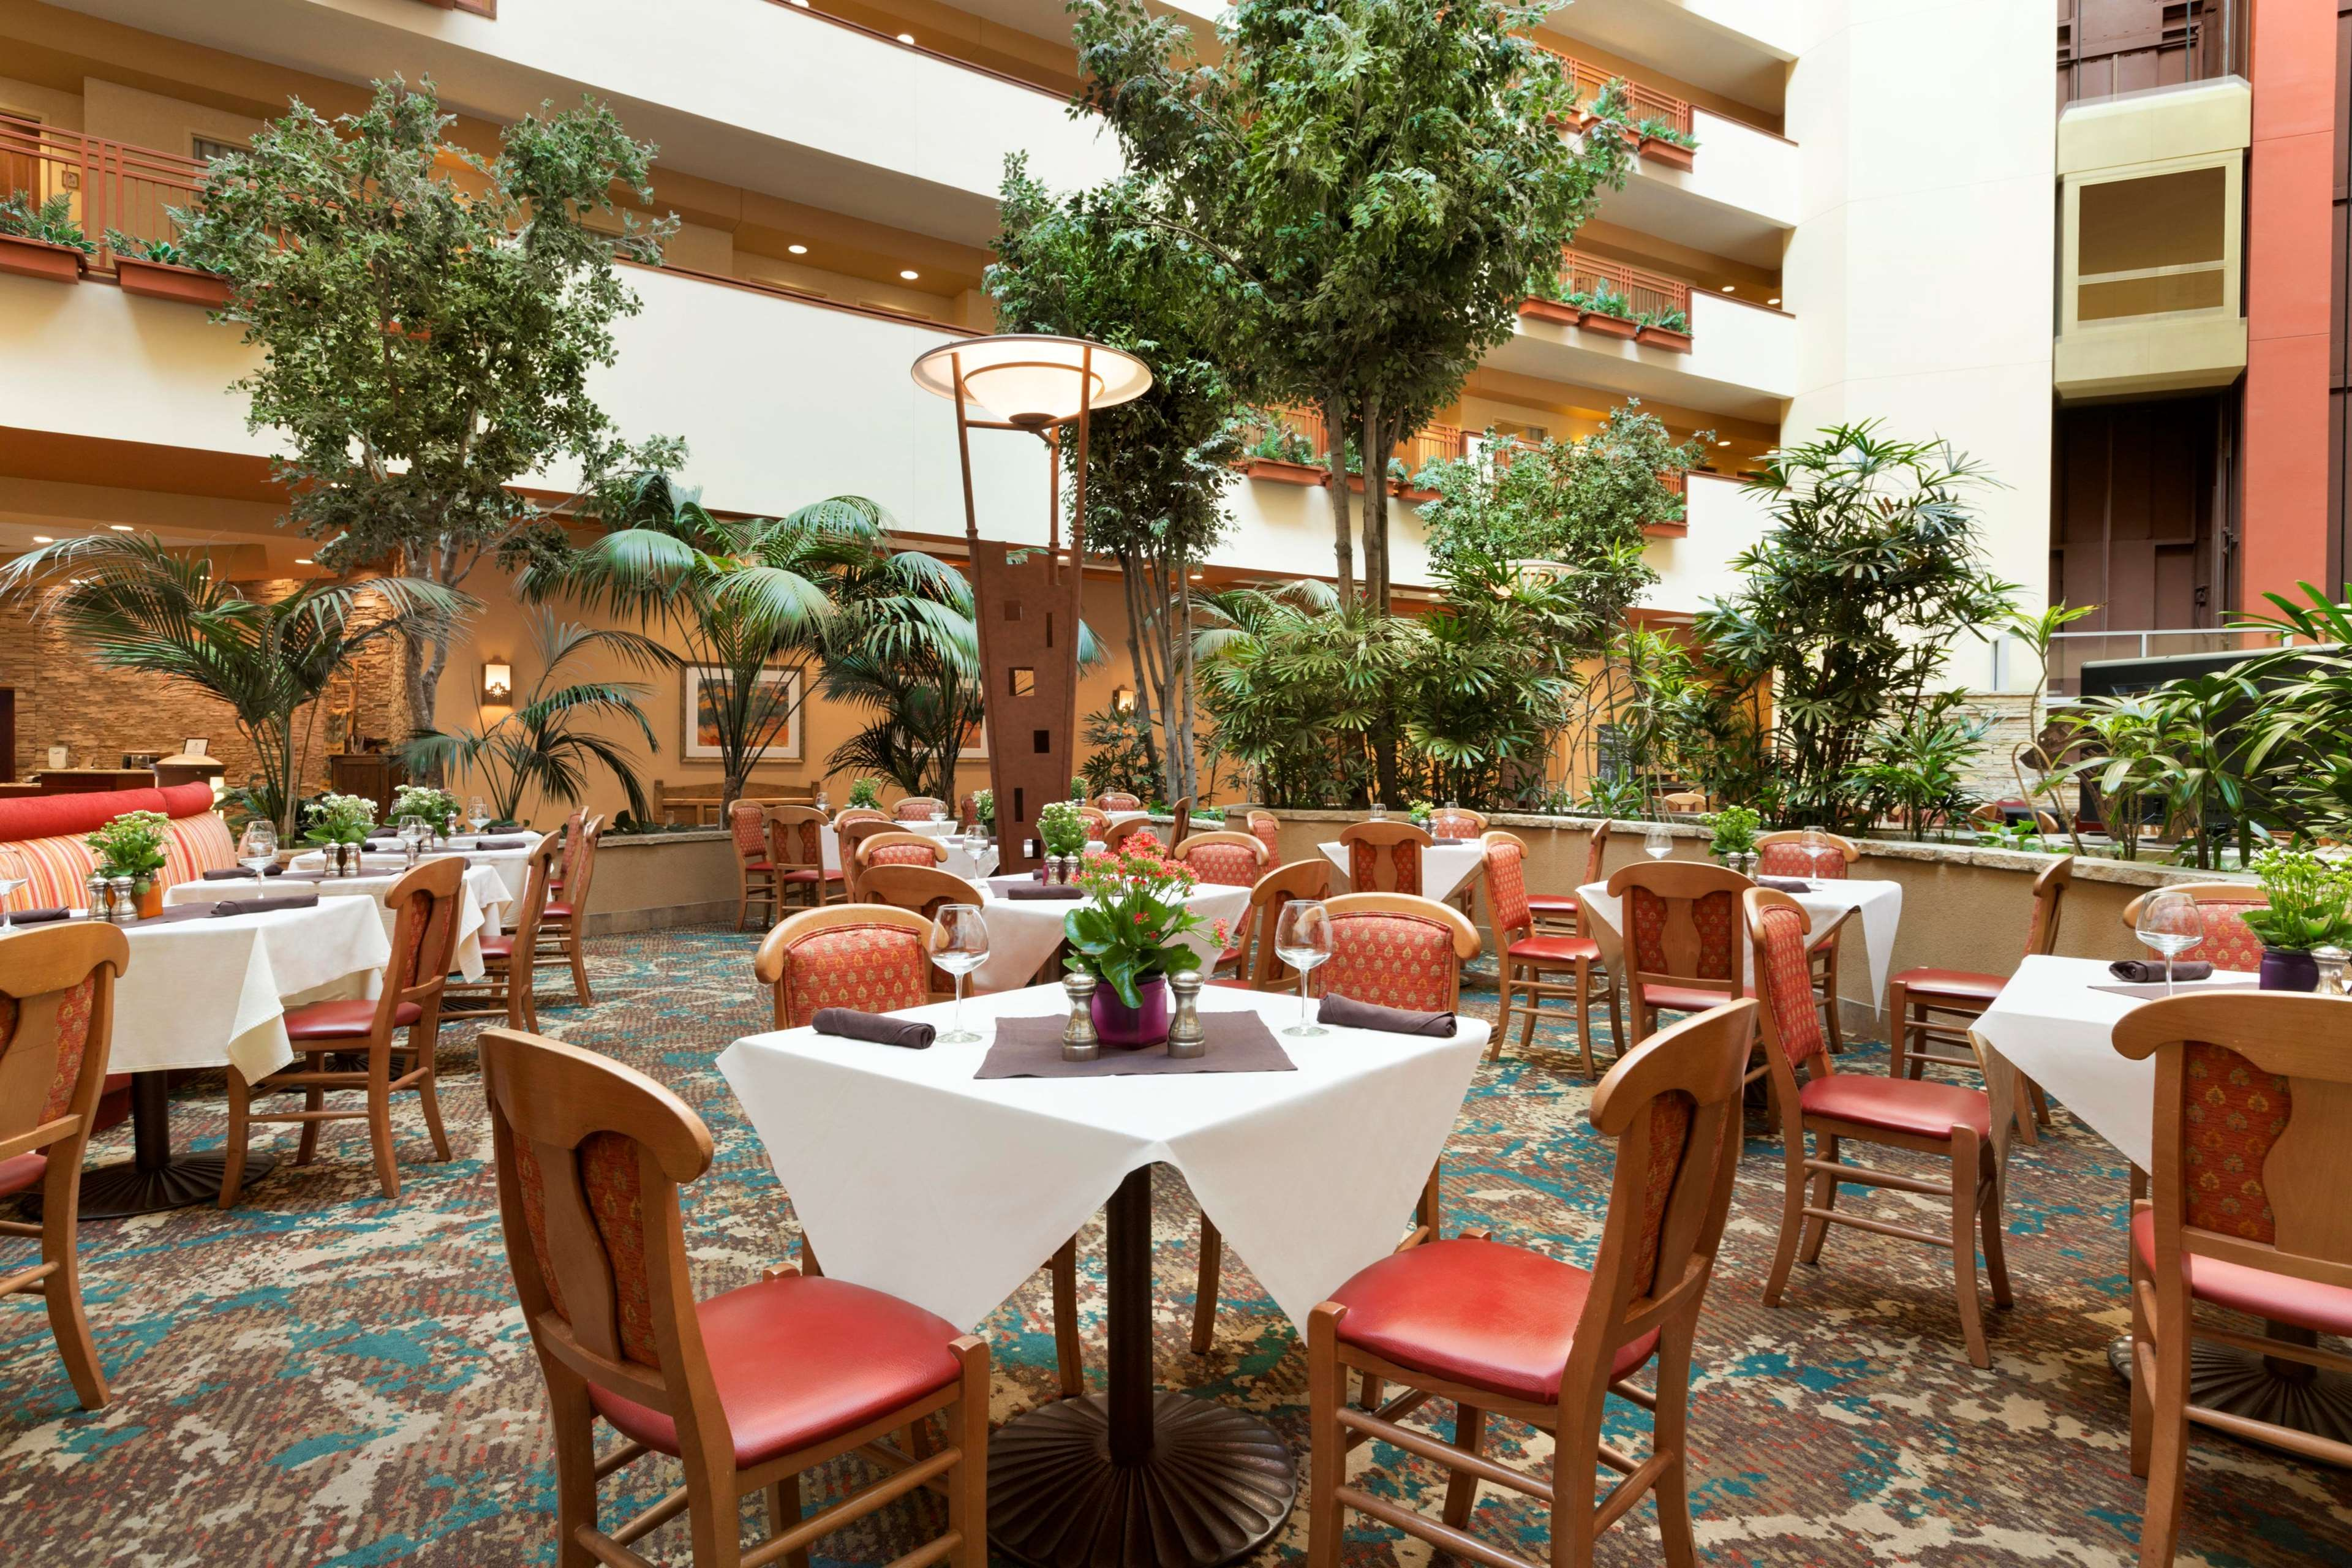 Embassy Suites by Hilton Albuquerque Hotel & Spa image 38